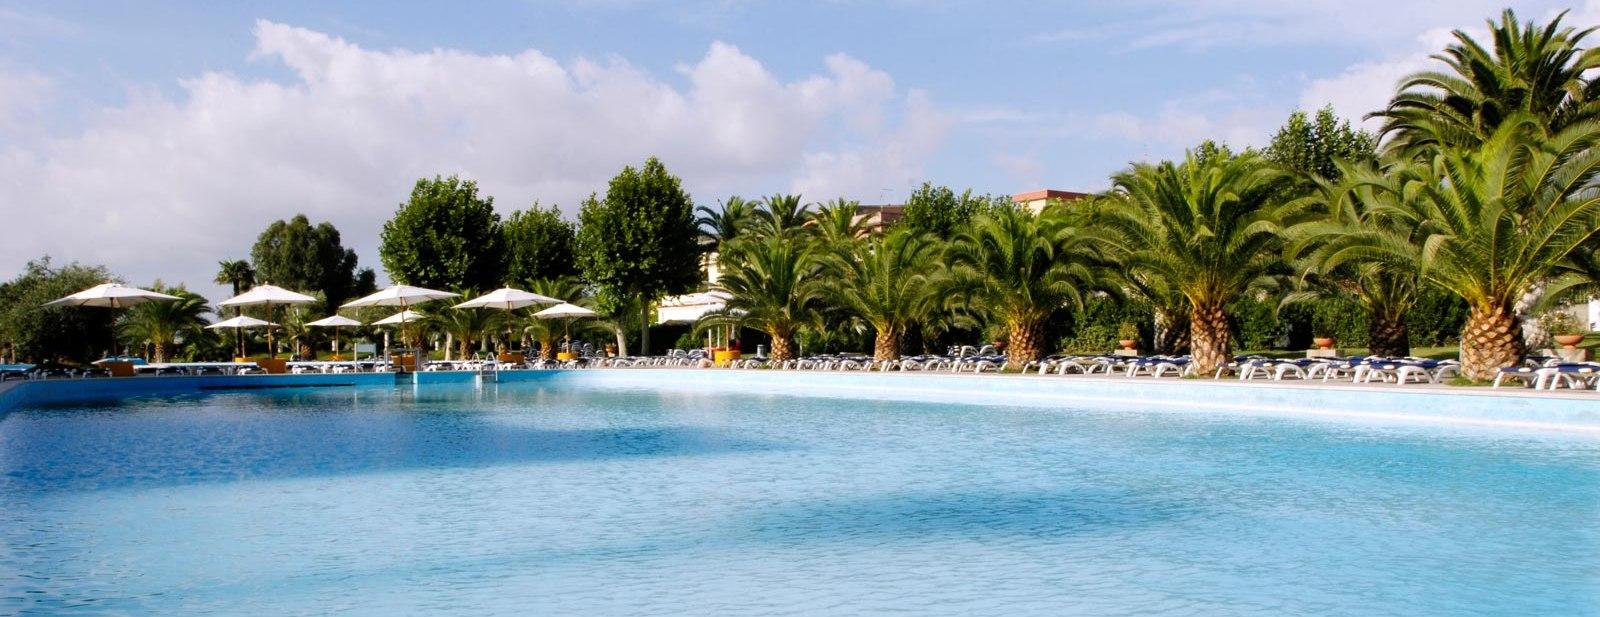 piscina-terme-di-tivoli